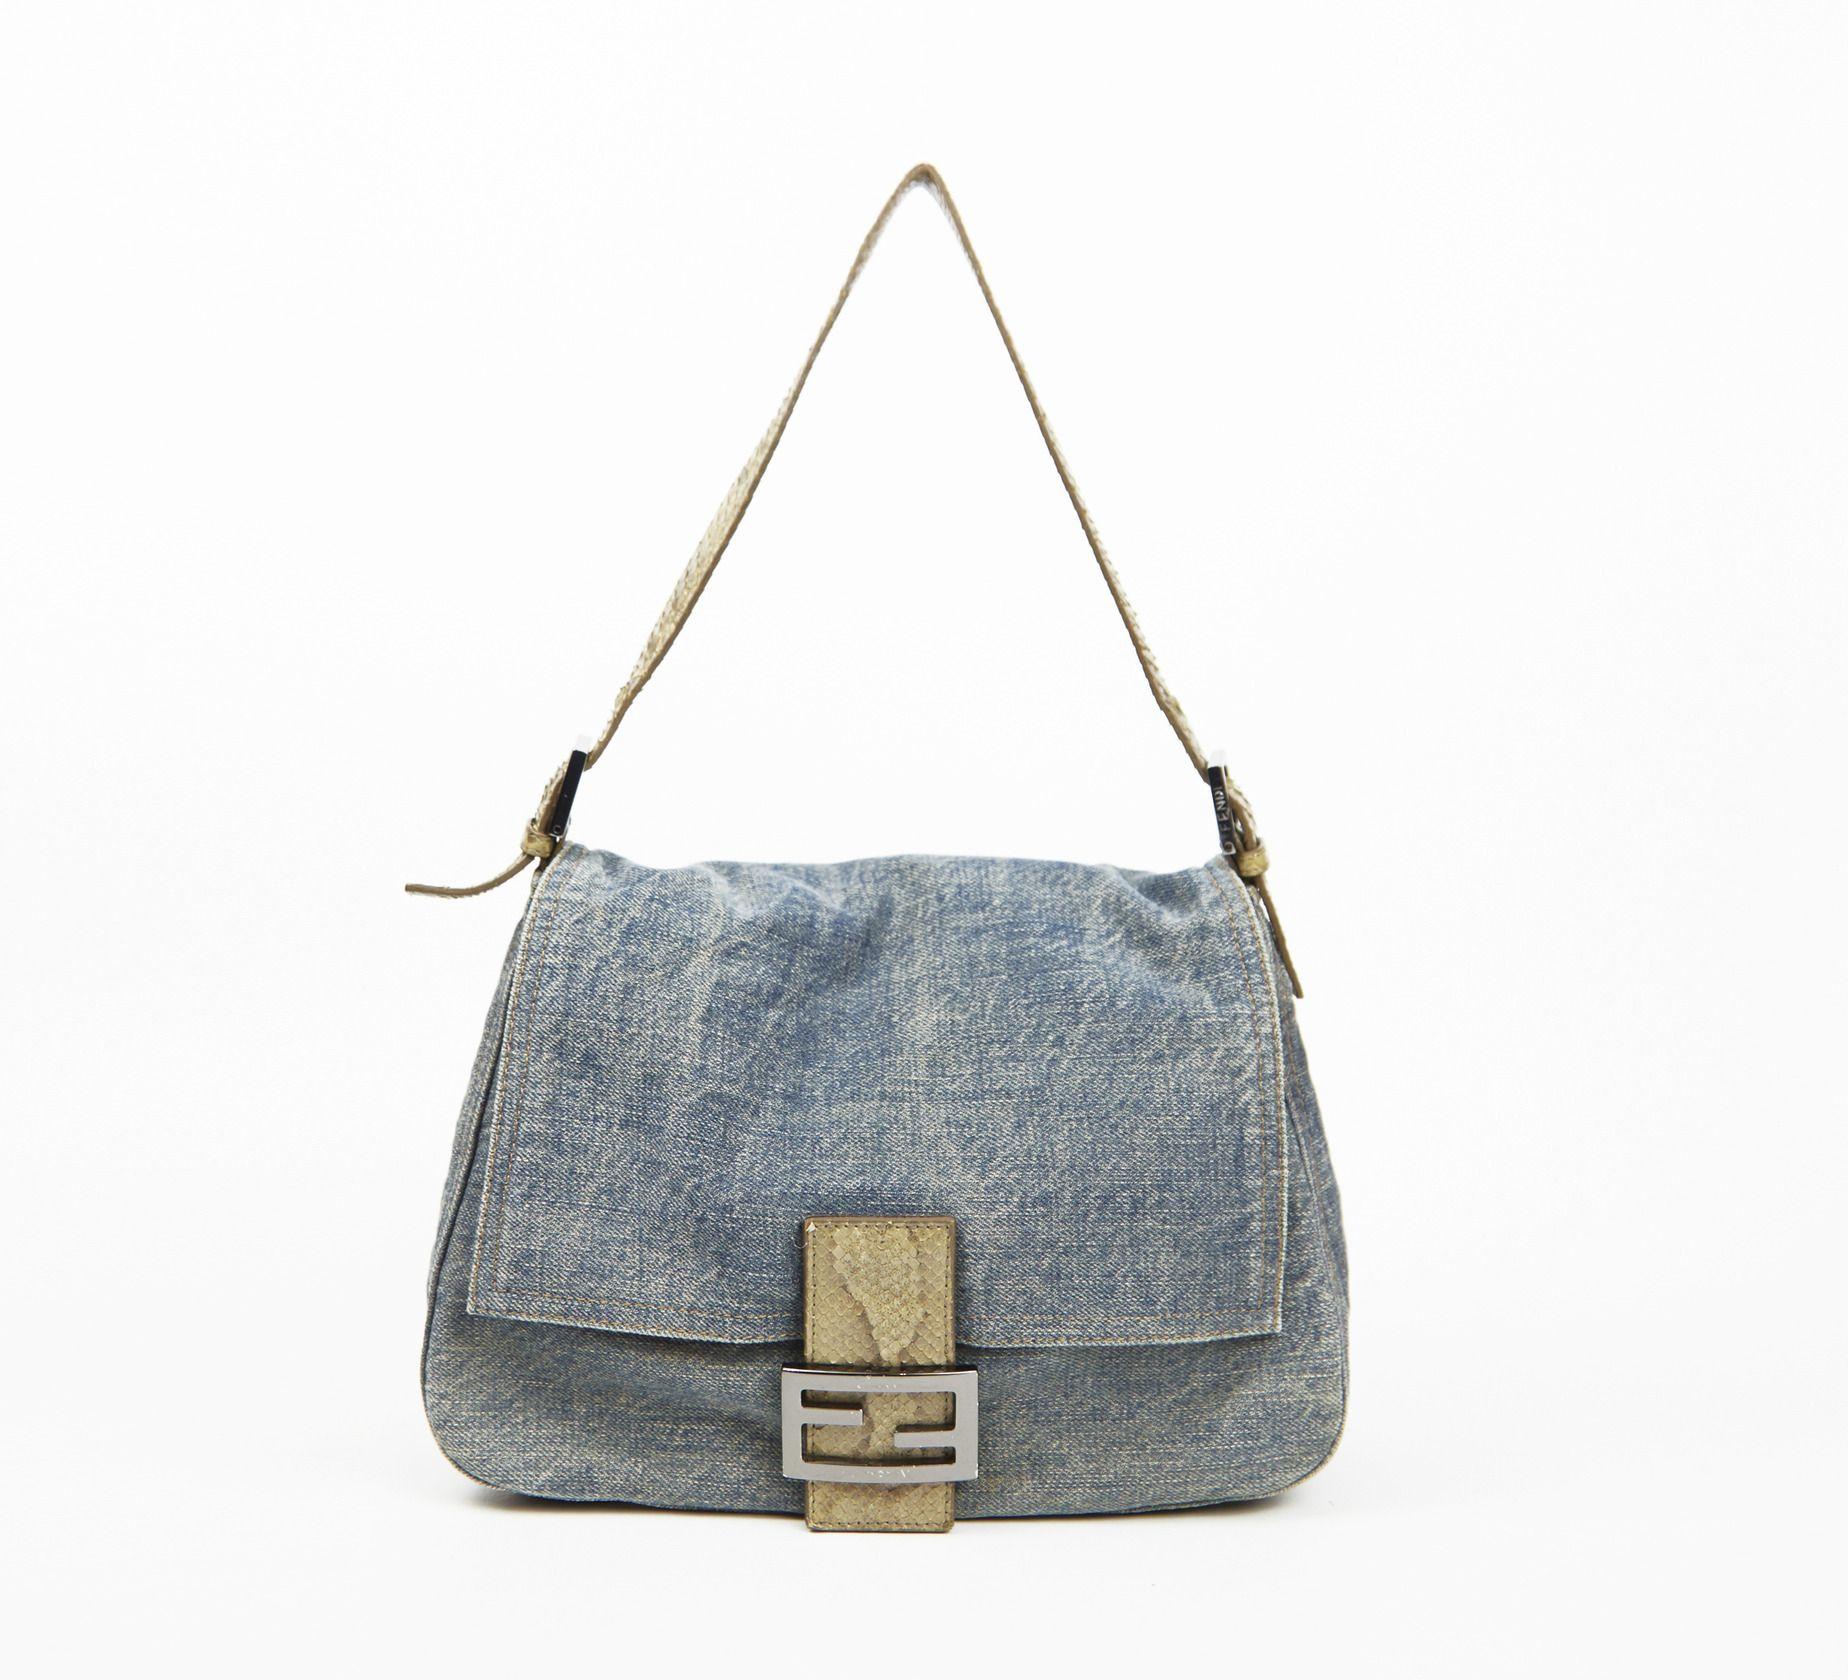 Fendi Blue And Beige Handbag